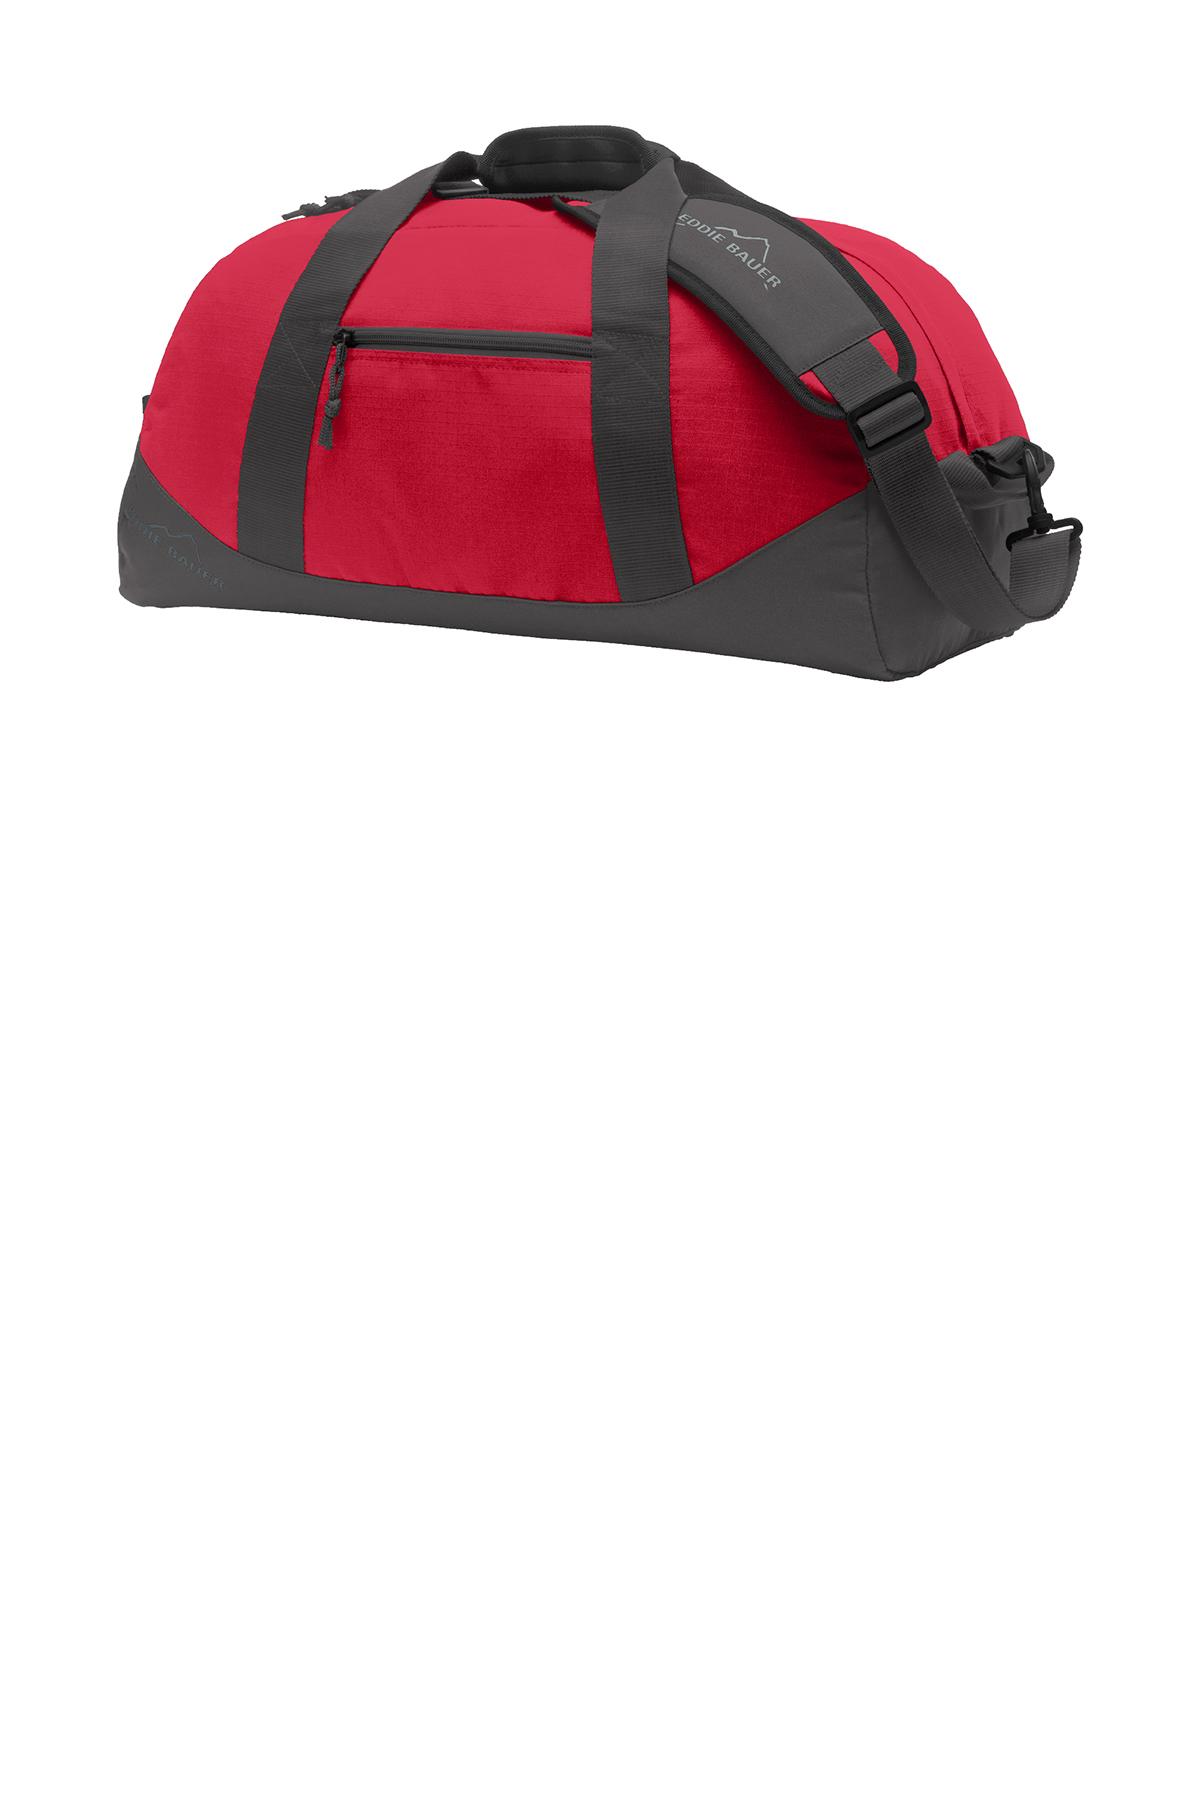 Eddie Bauer® Medium Ripstop Duffel | Duffels | Bags | SanMar